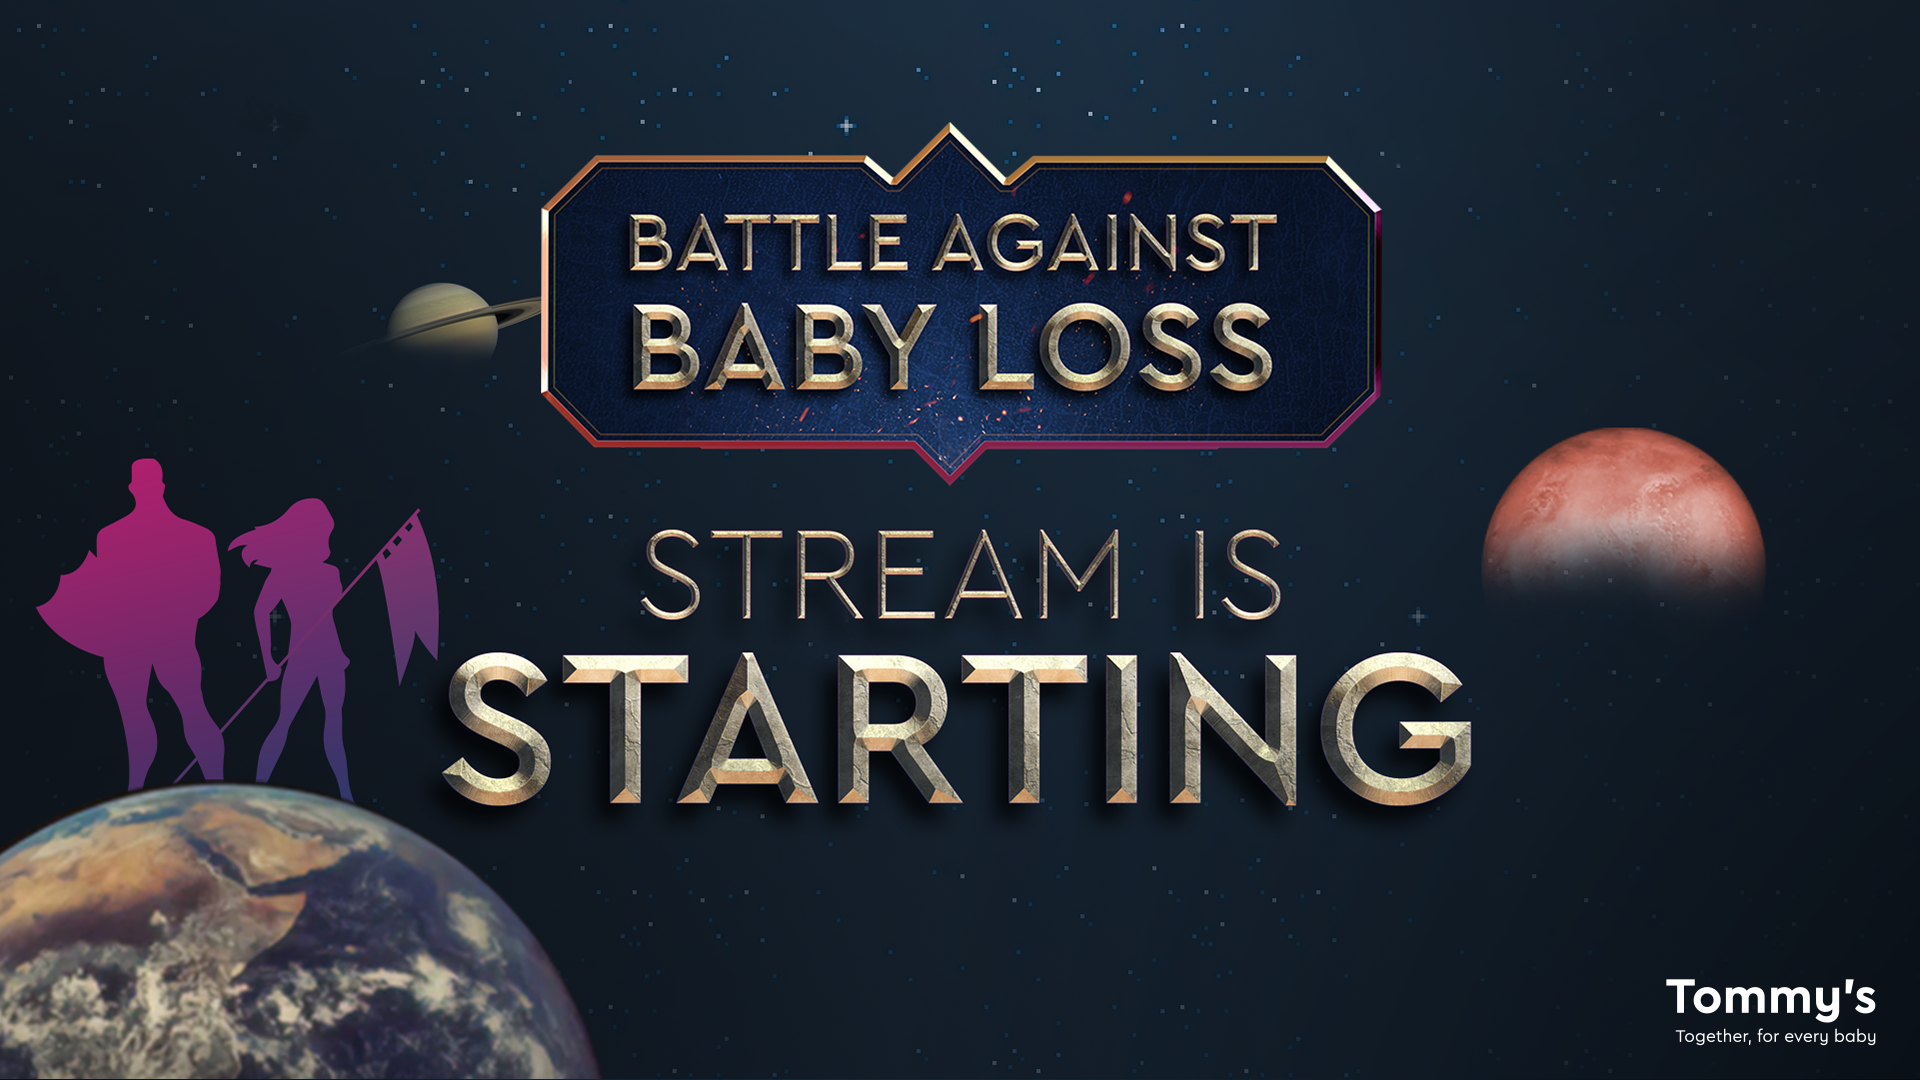 Stream is Starting